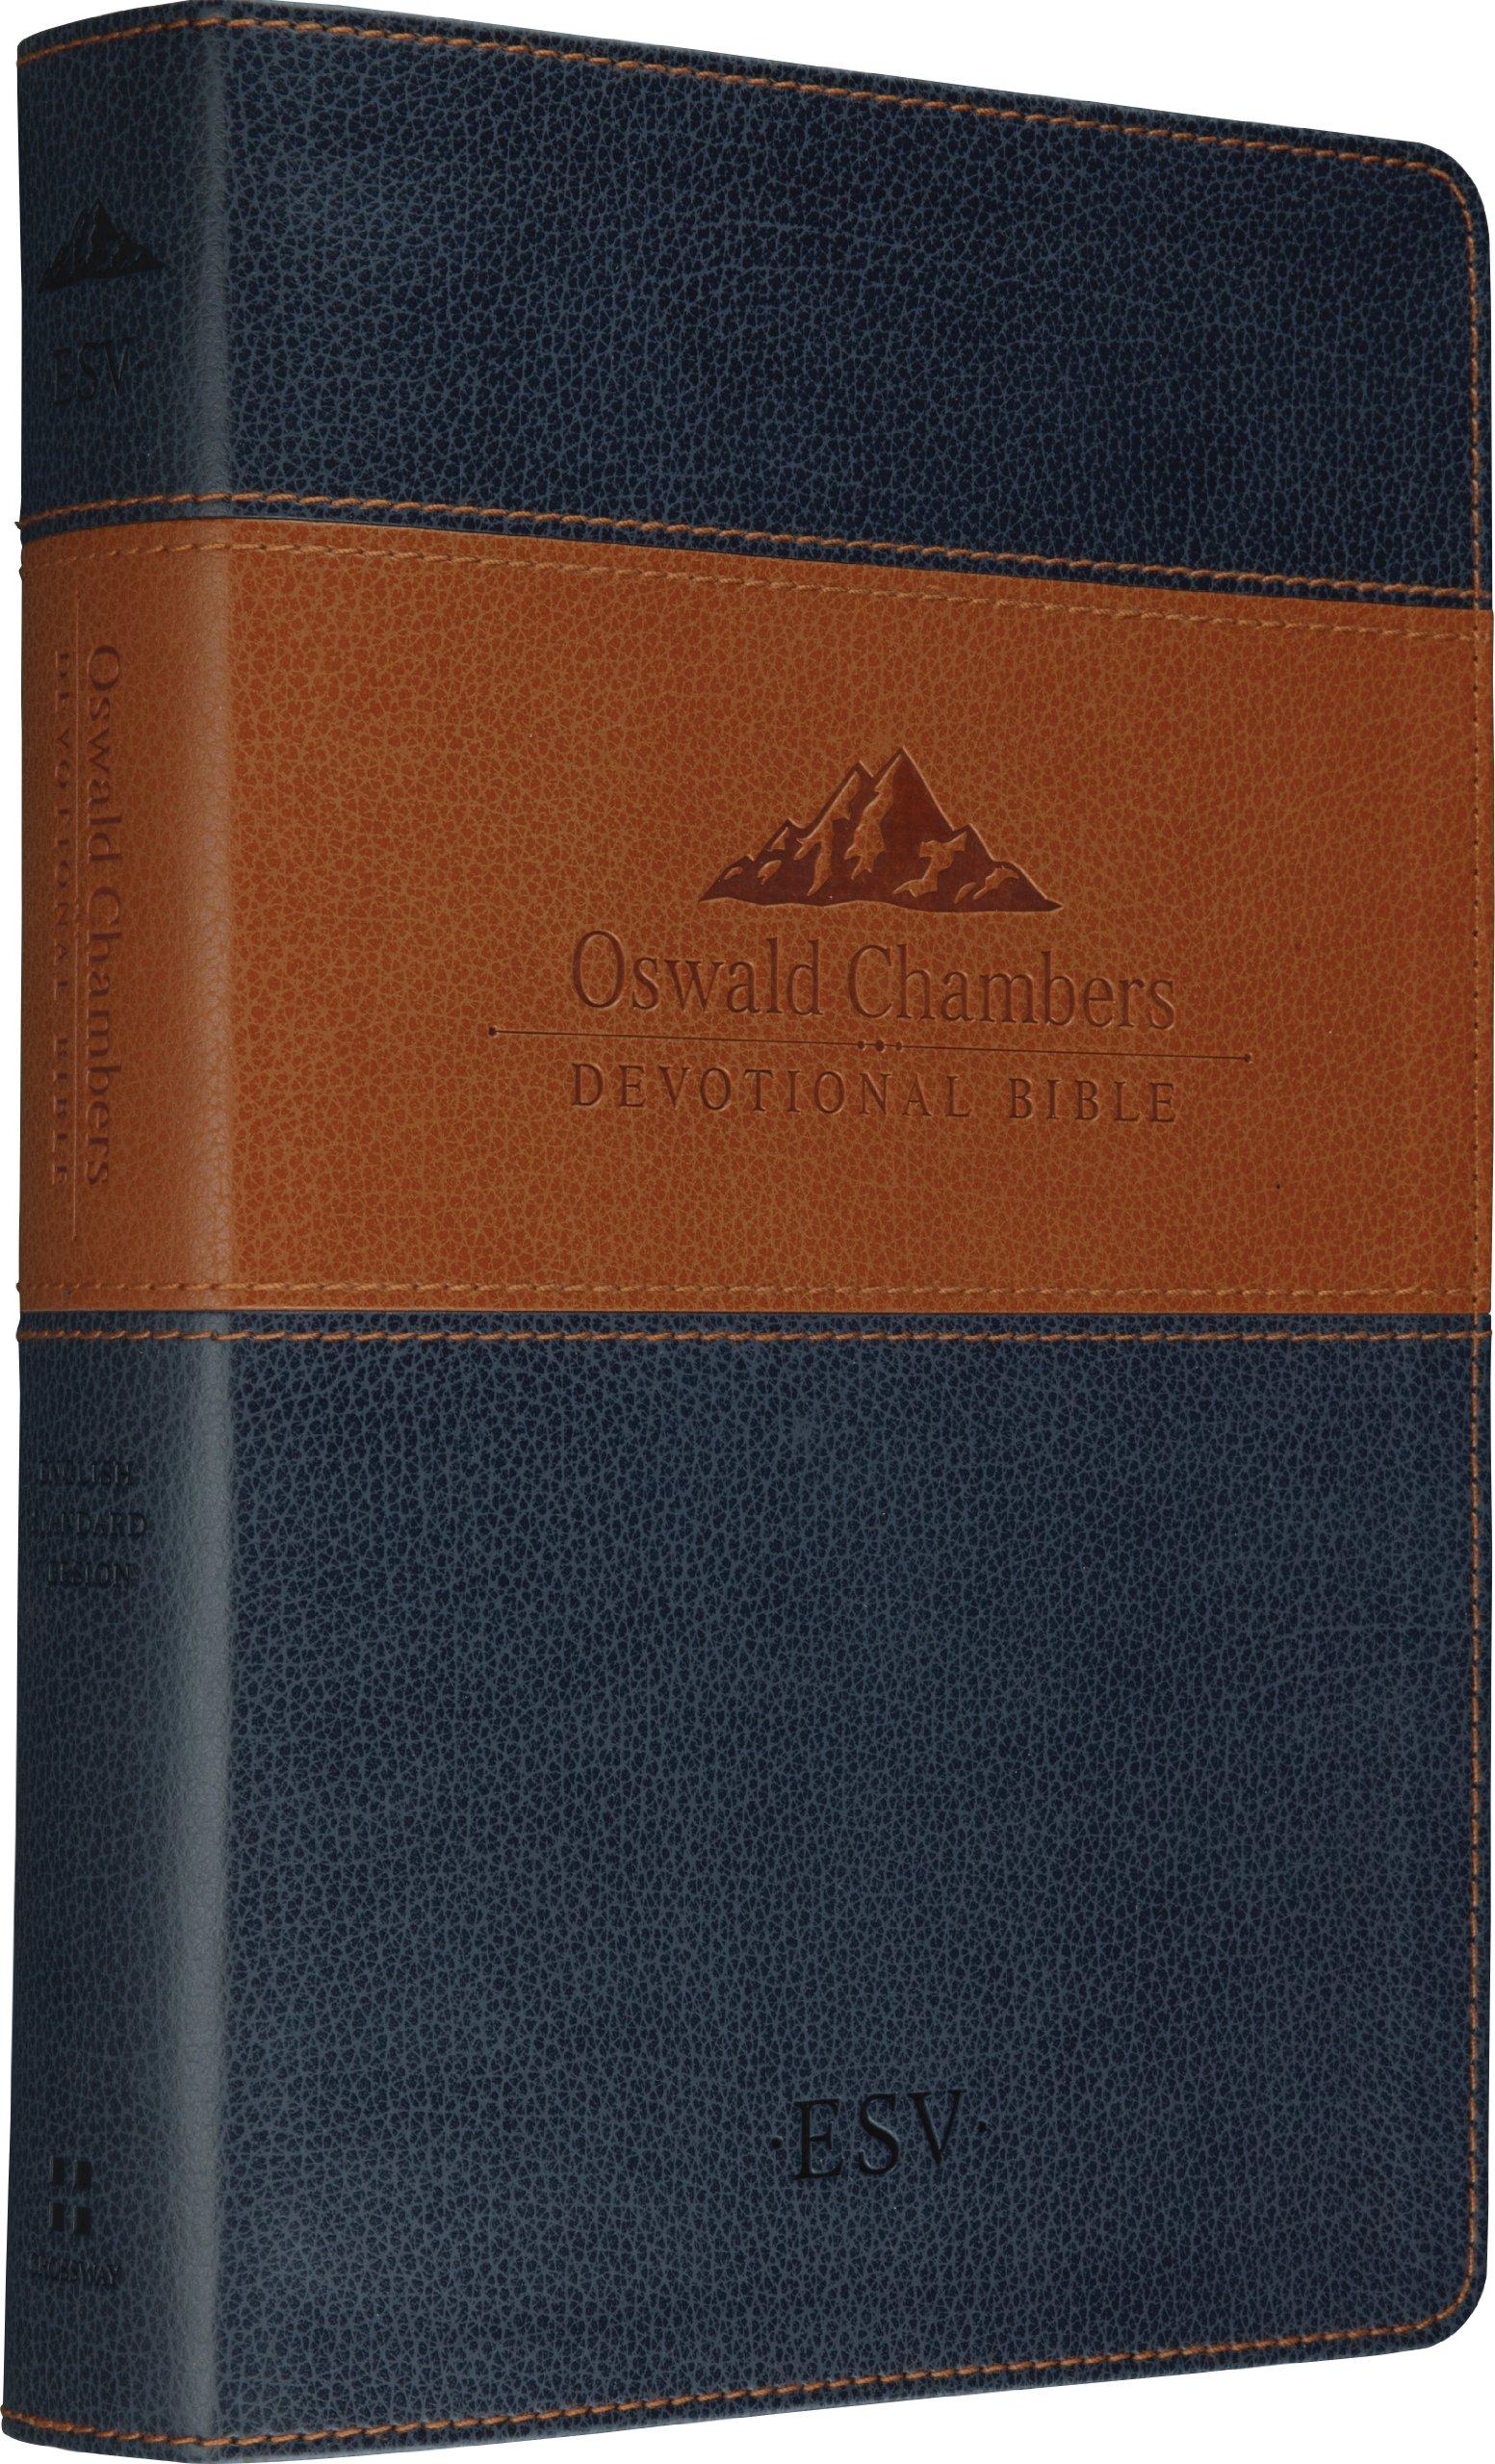 ESV Oswald Chambers Devotional Bible (TruTone, Navy/Tan) pdf